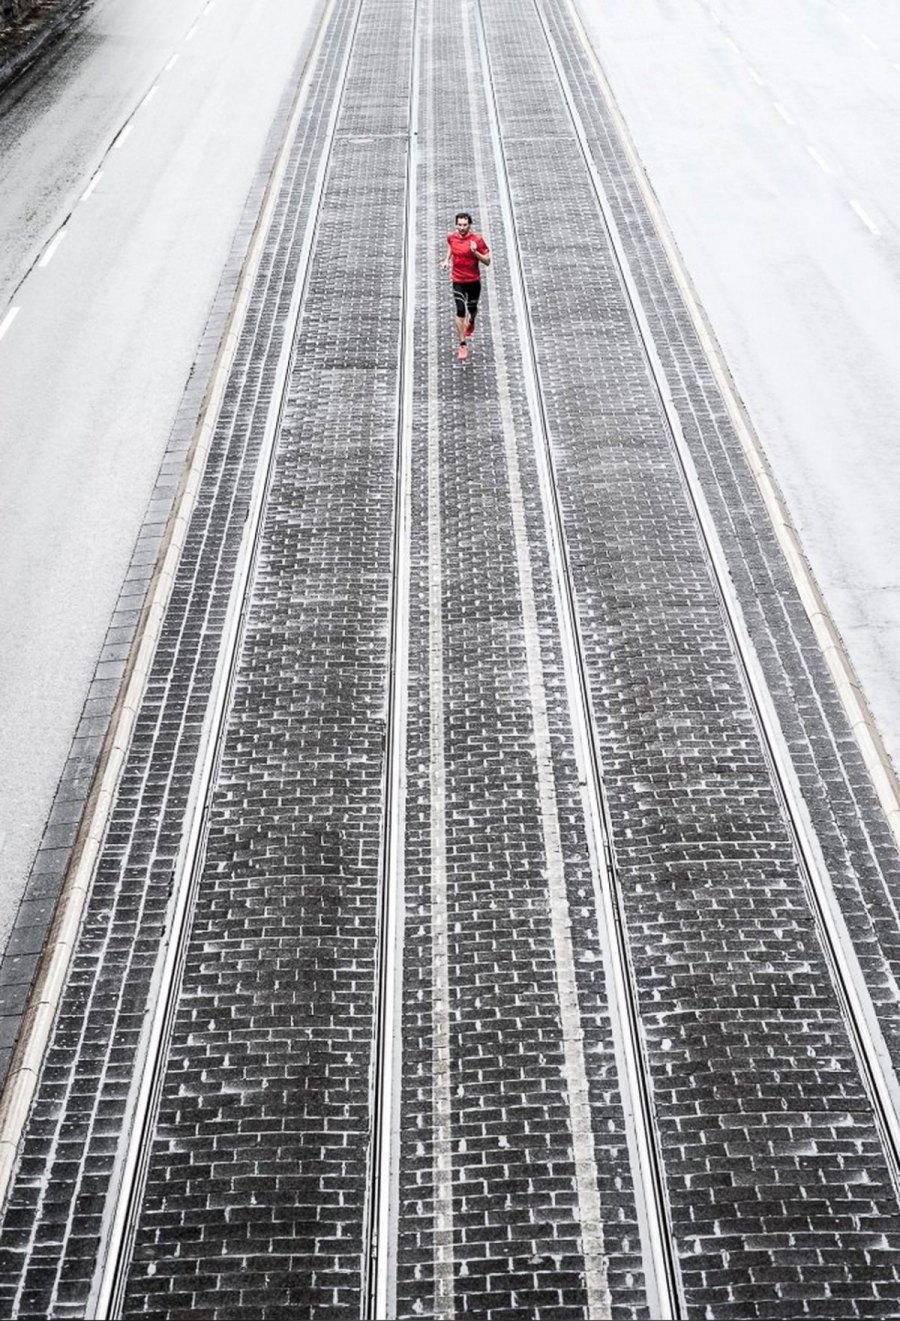 Running in the City by Florian Eisermann